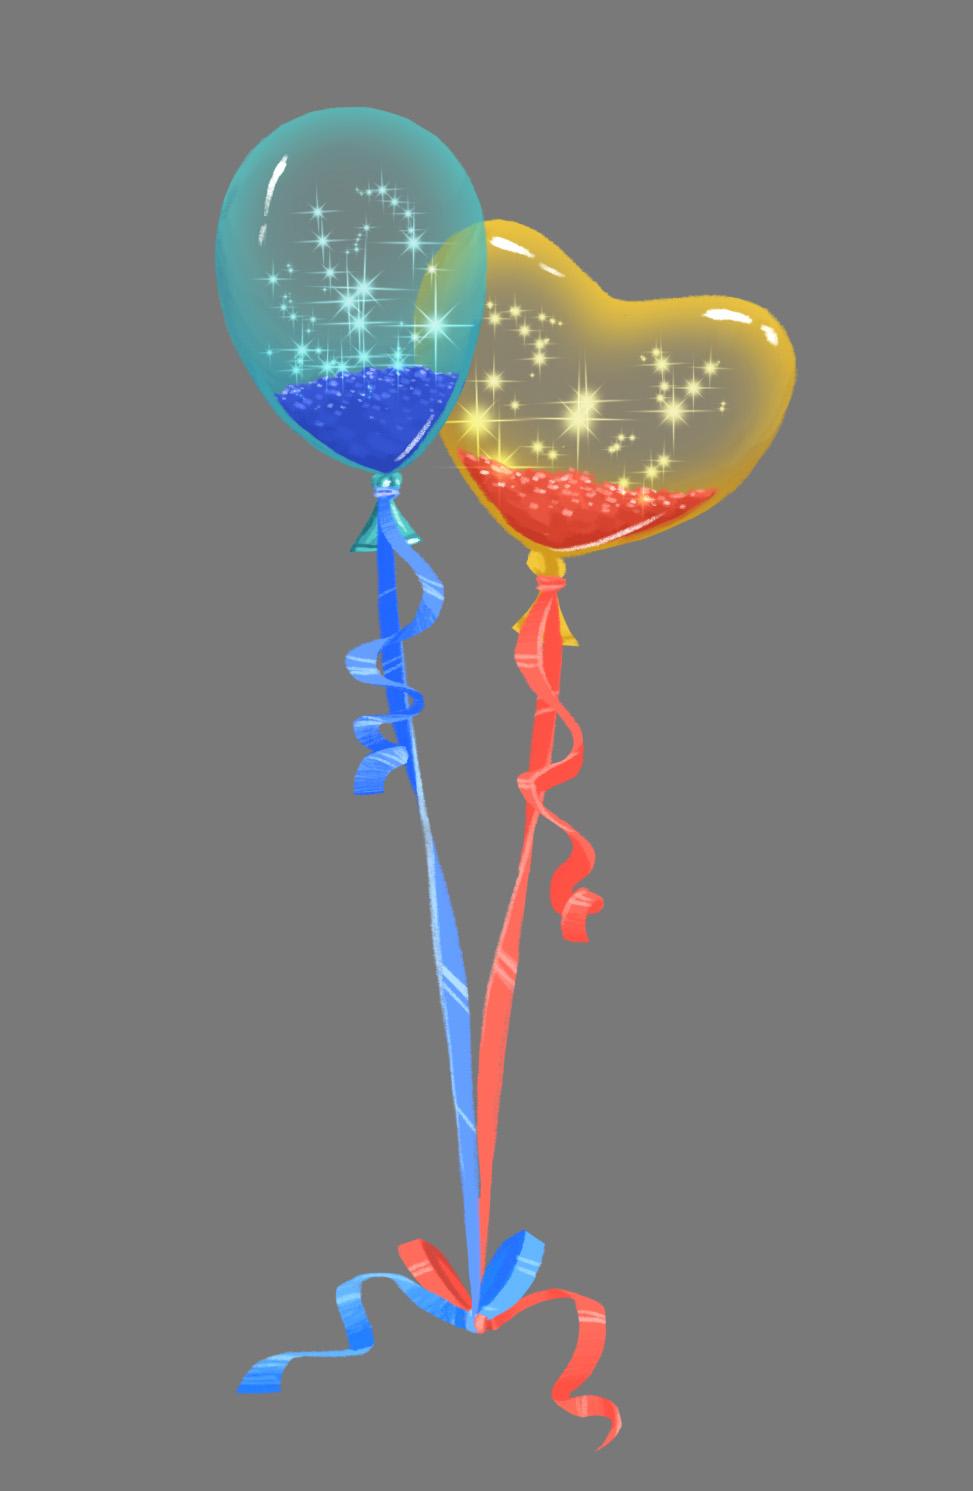 confetti_balloons.jpg